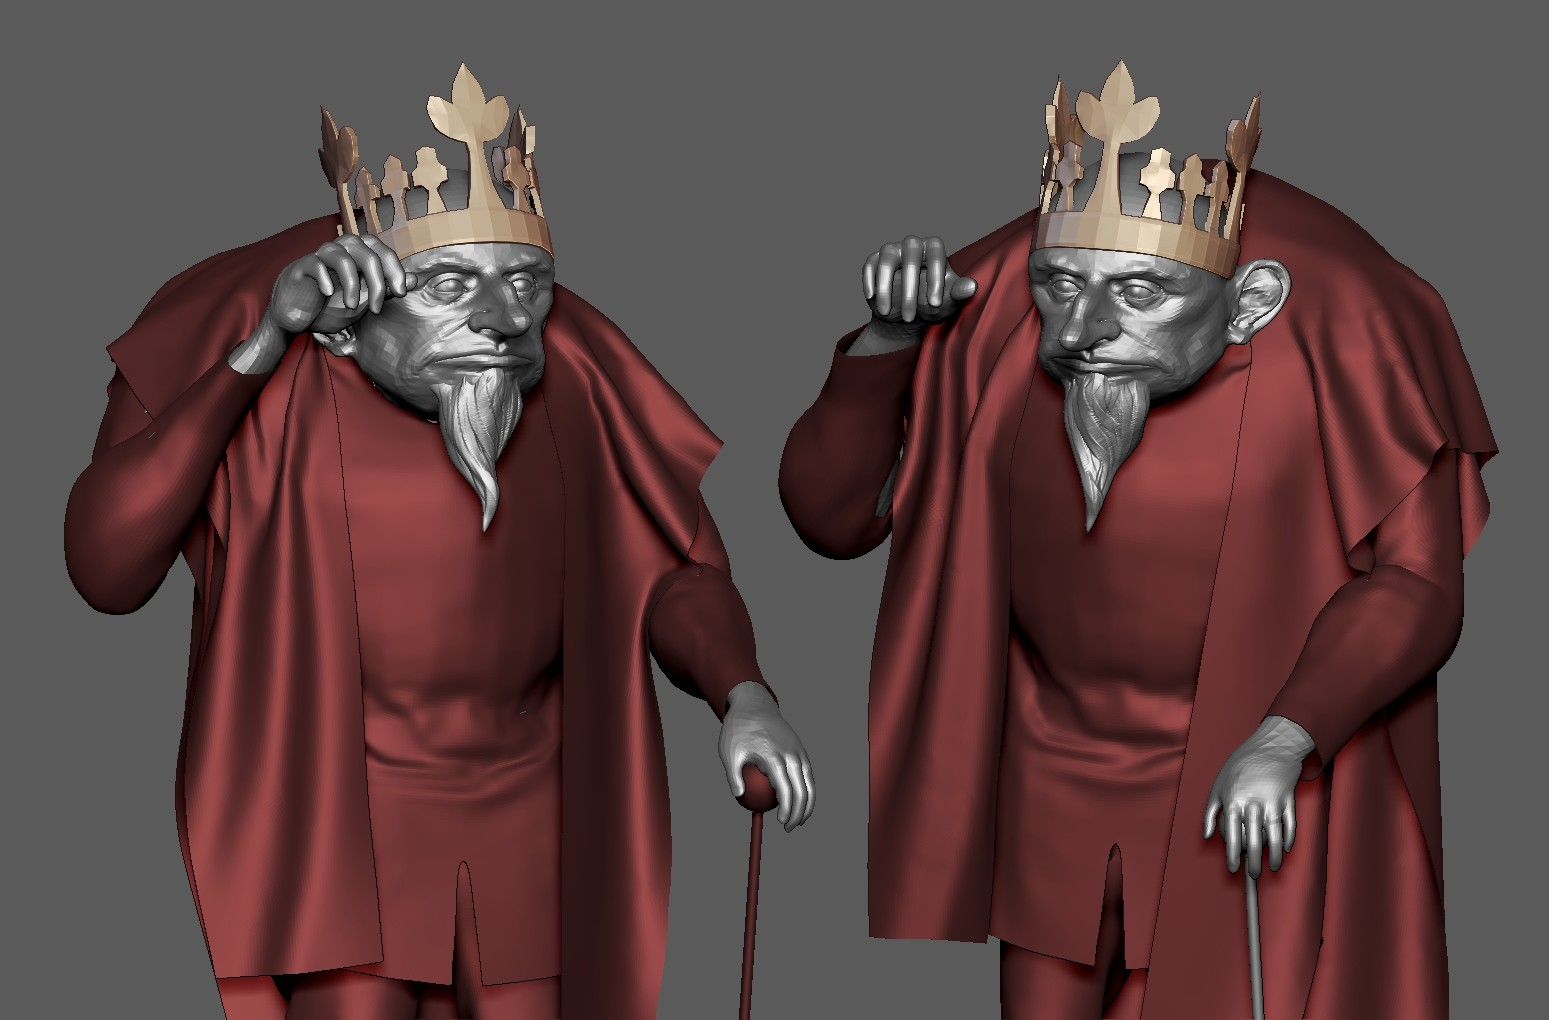 Pierre benjamin king trst